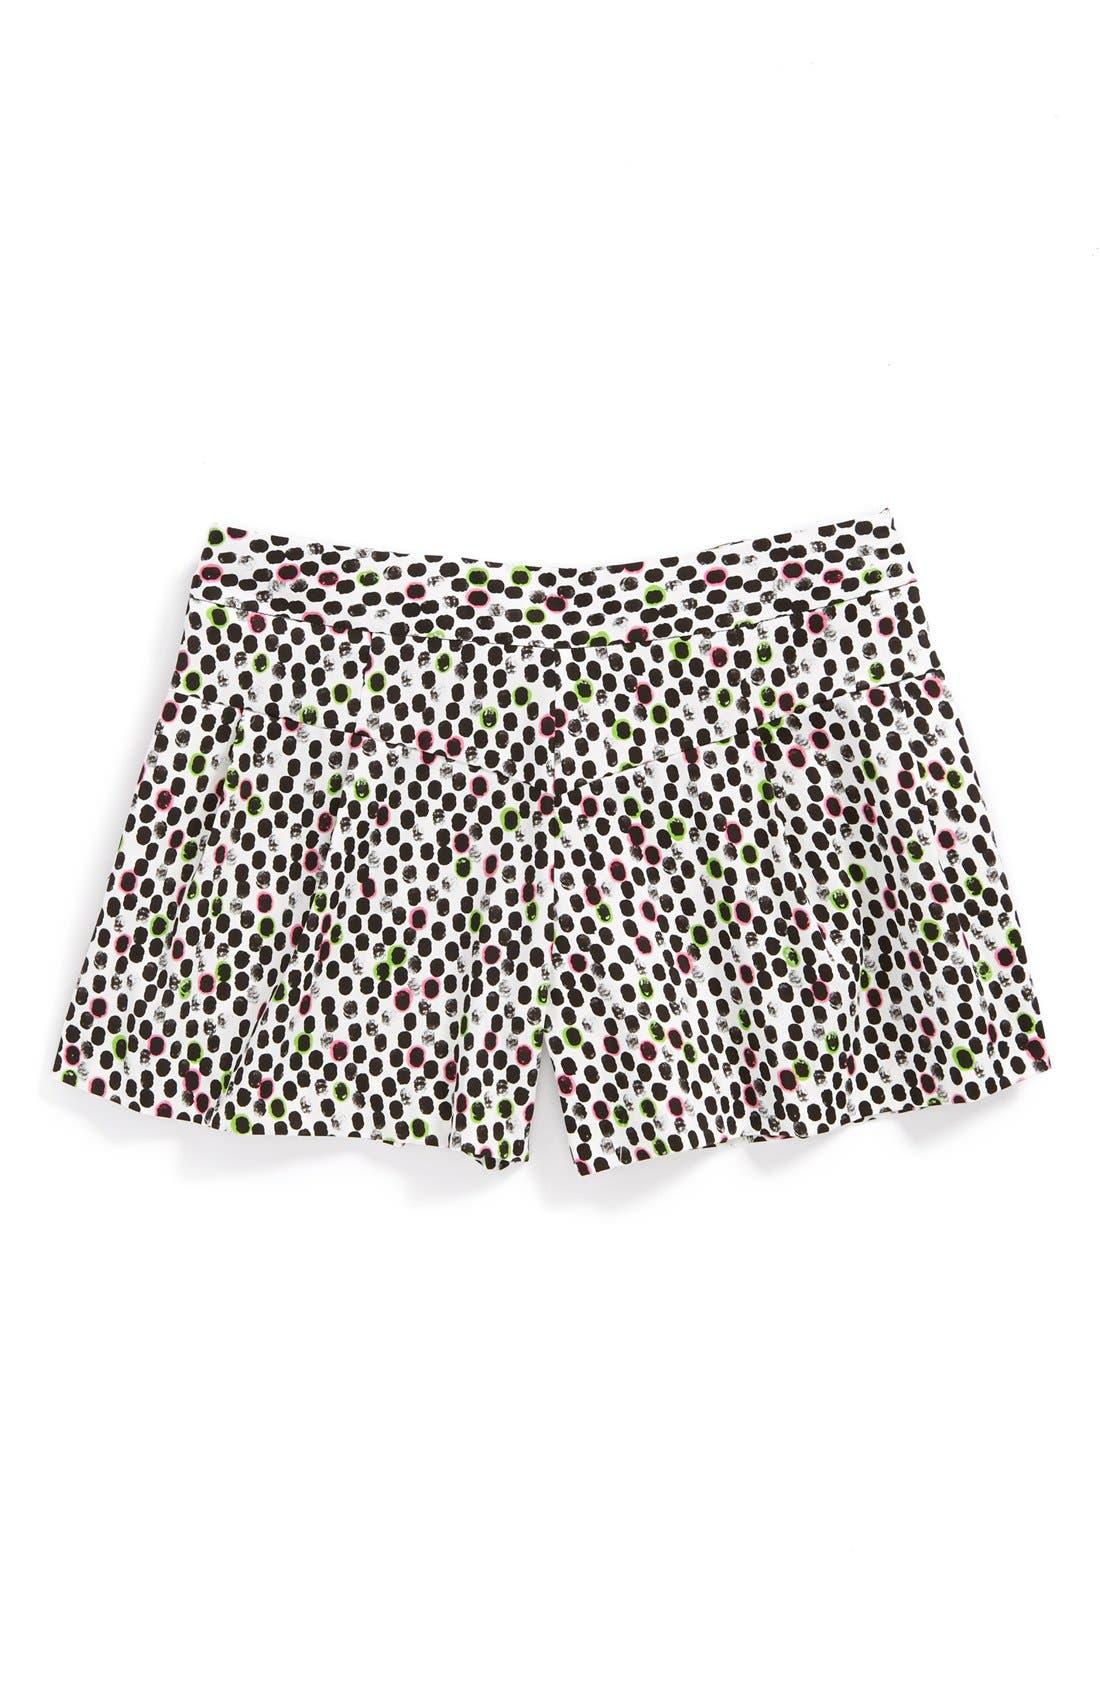 Main Image - Milly Minis 'Ocelot' Shorts (Big Girls)